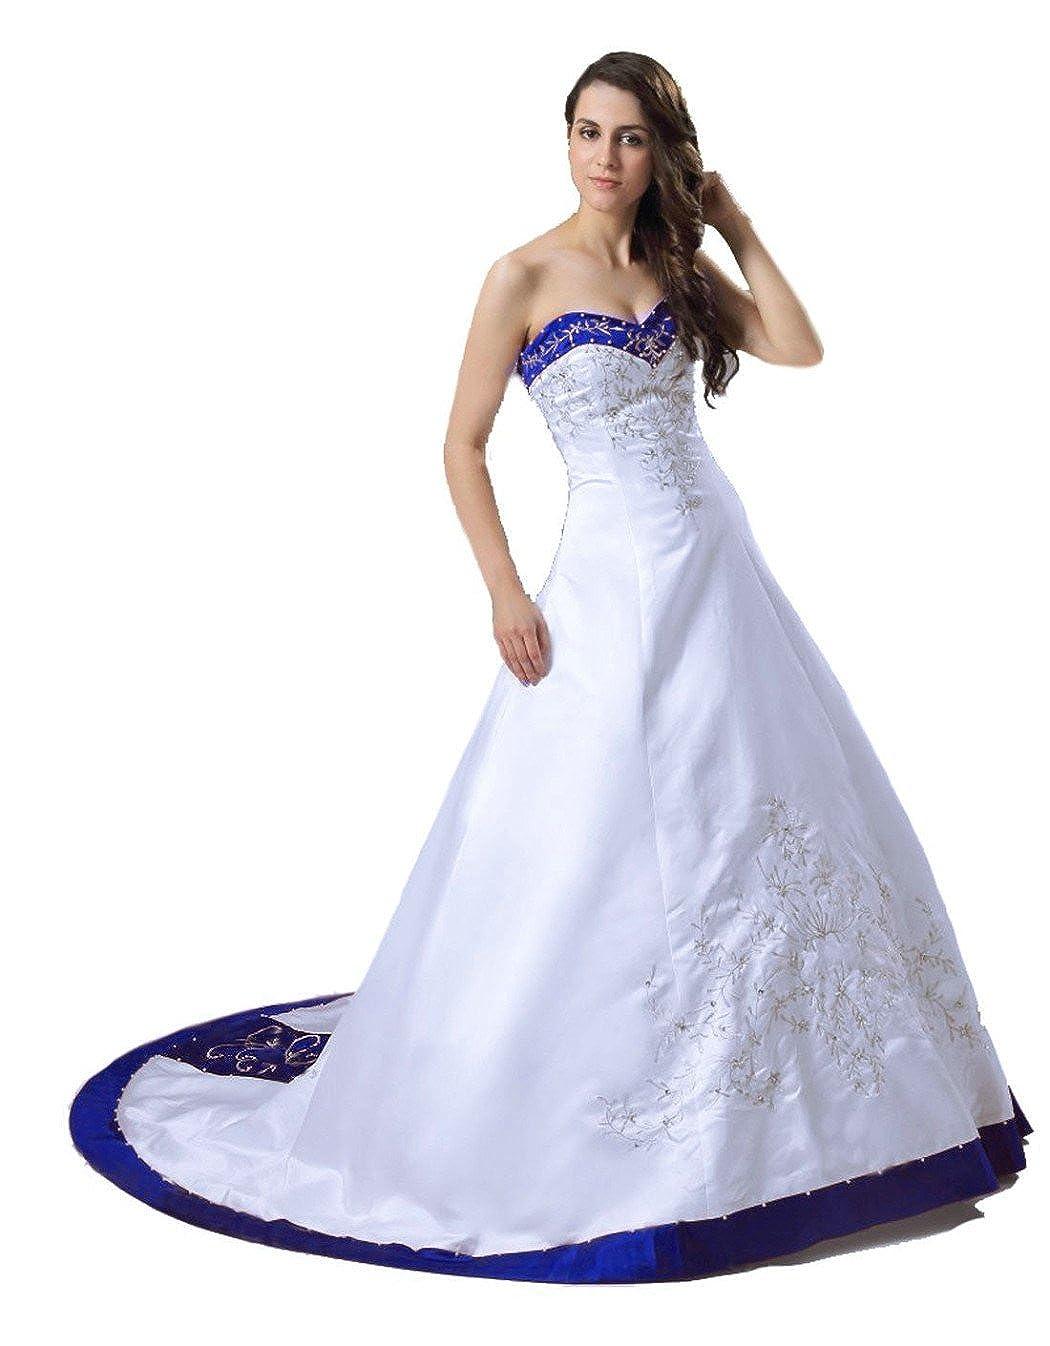 RohmBridal Womens Strapless Satin A-line Bridal Wedding Dress